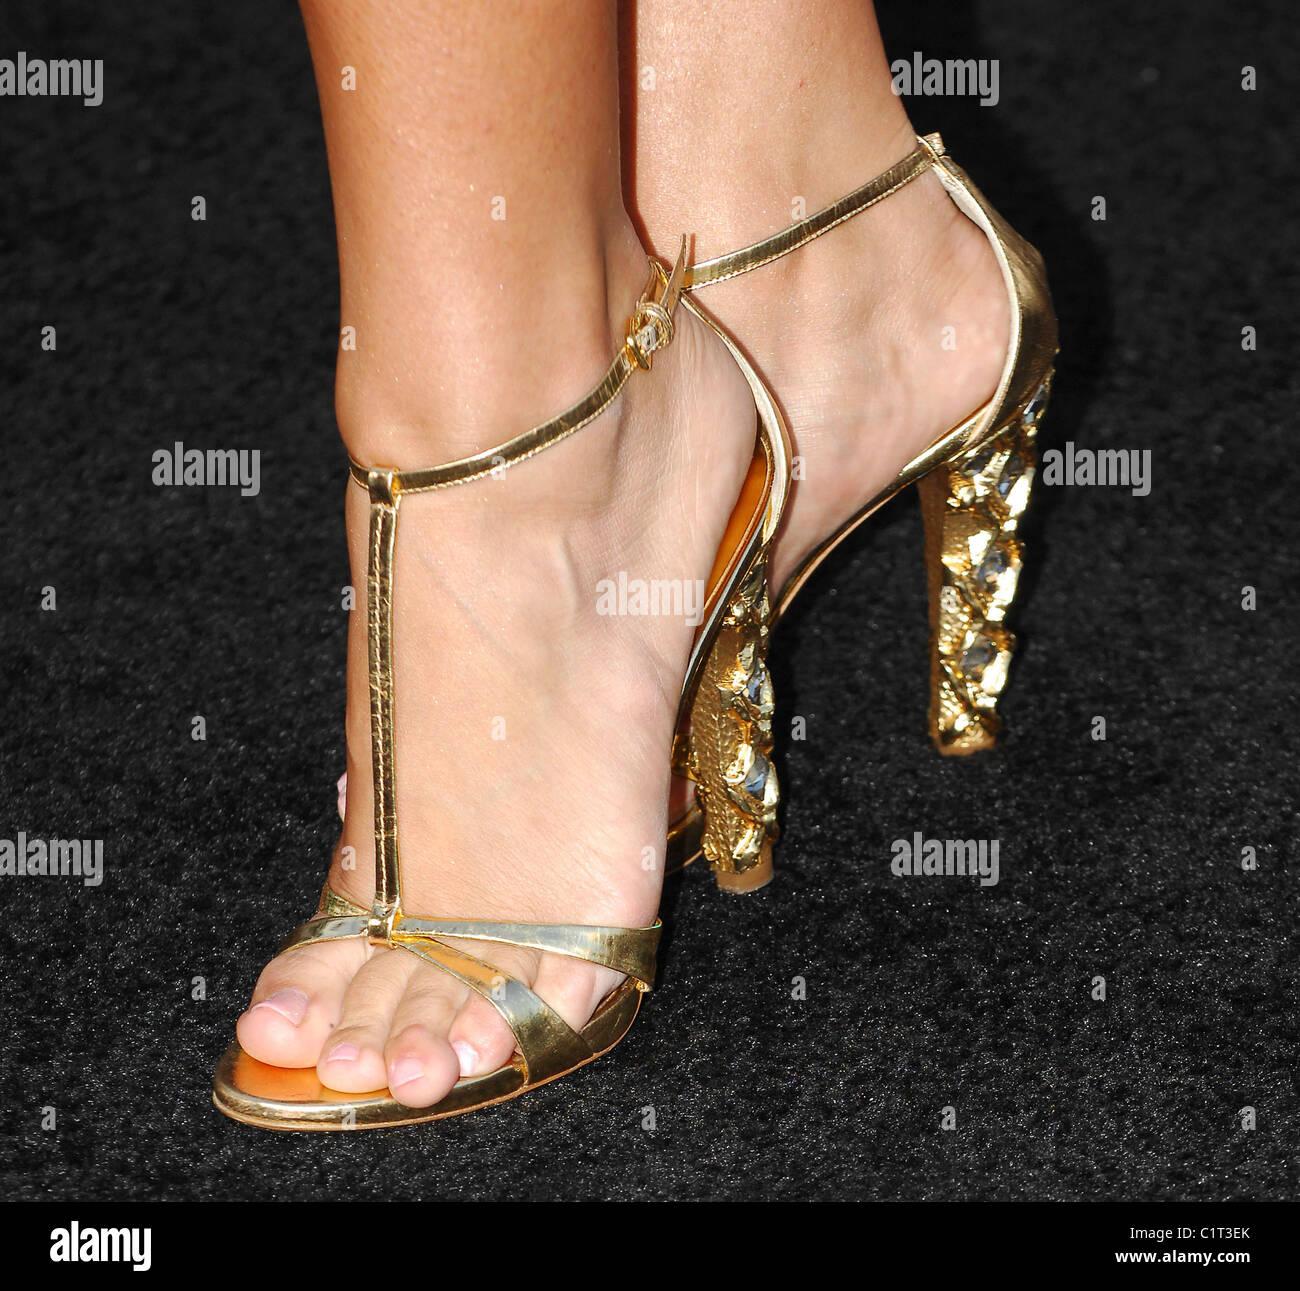 Feet Aubrey ODay